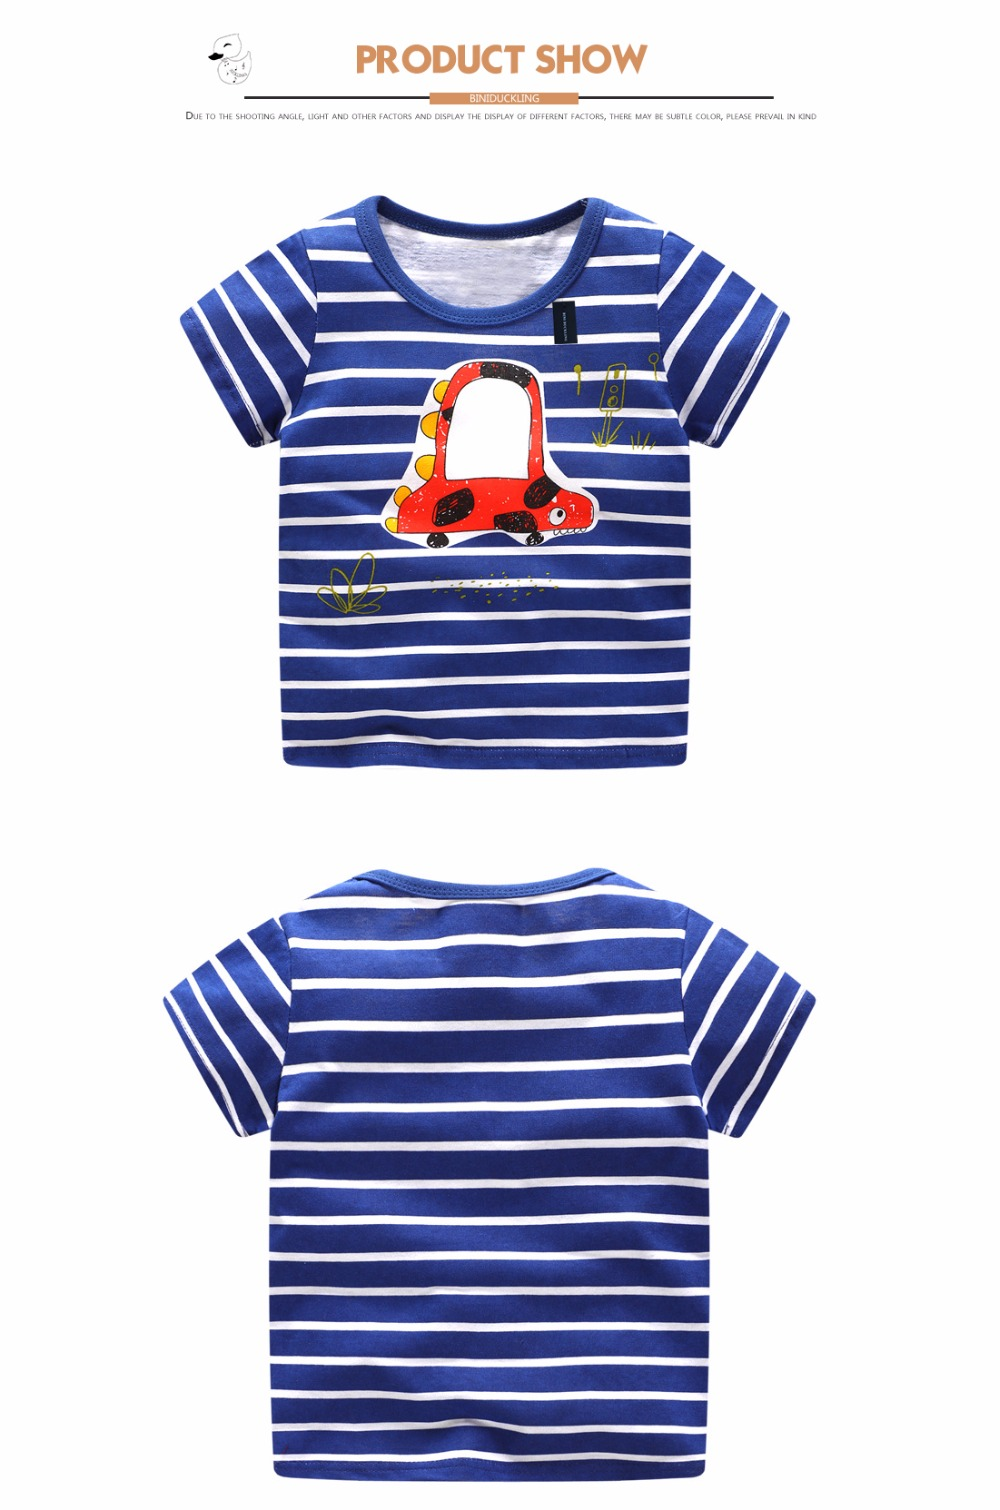 HTB1UgxregjN8KJjSZFCq6z3GpXaK - BINIDUCKLING Children T-shirt Boys t shirt Short Sleeves Tees Summer Kids Tops Dinosaur printed Baby Boy Clothing Cotton fireman